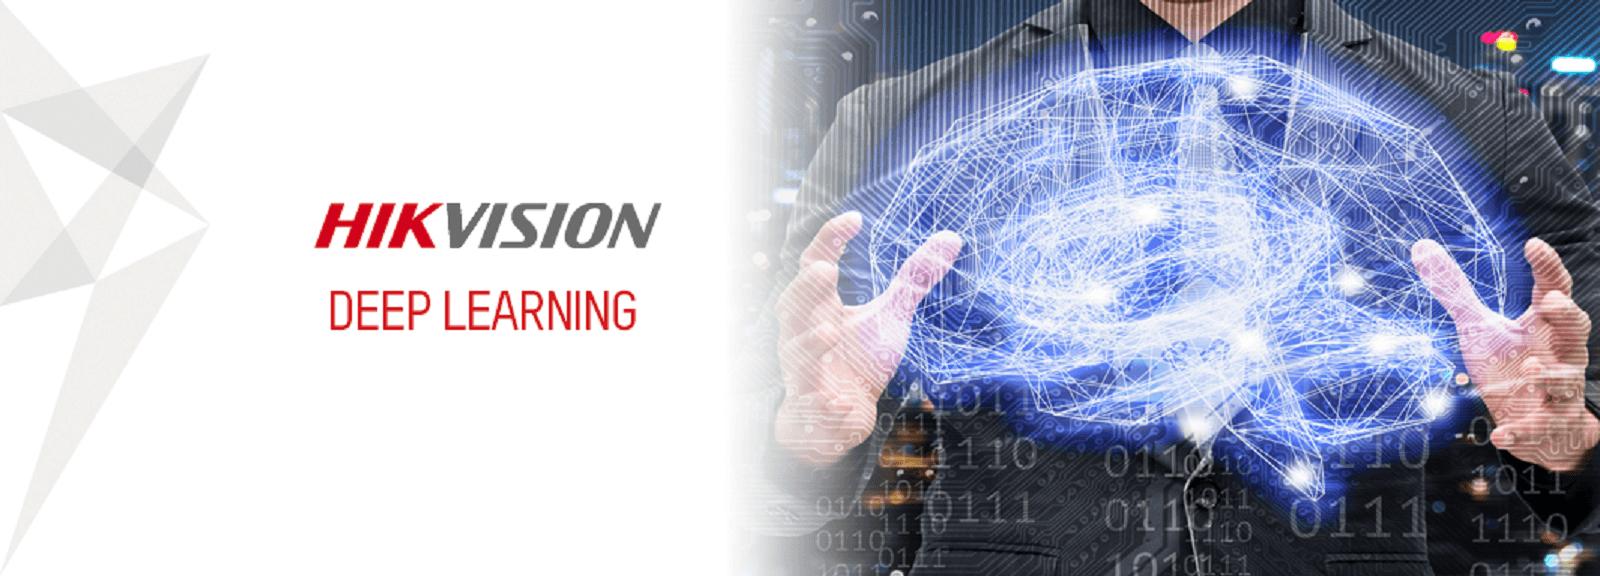 Deep Learning - sztuczna inteligencja od Hikvision » hikvision deeplearning 01